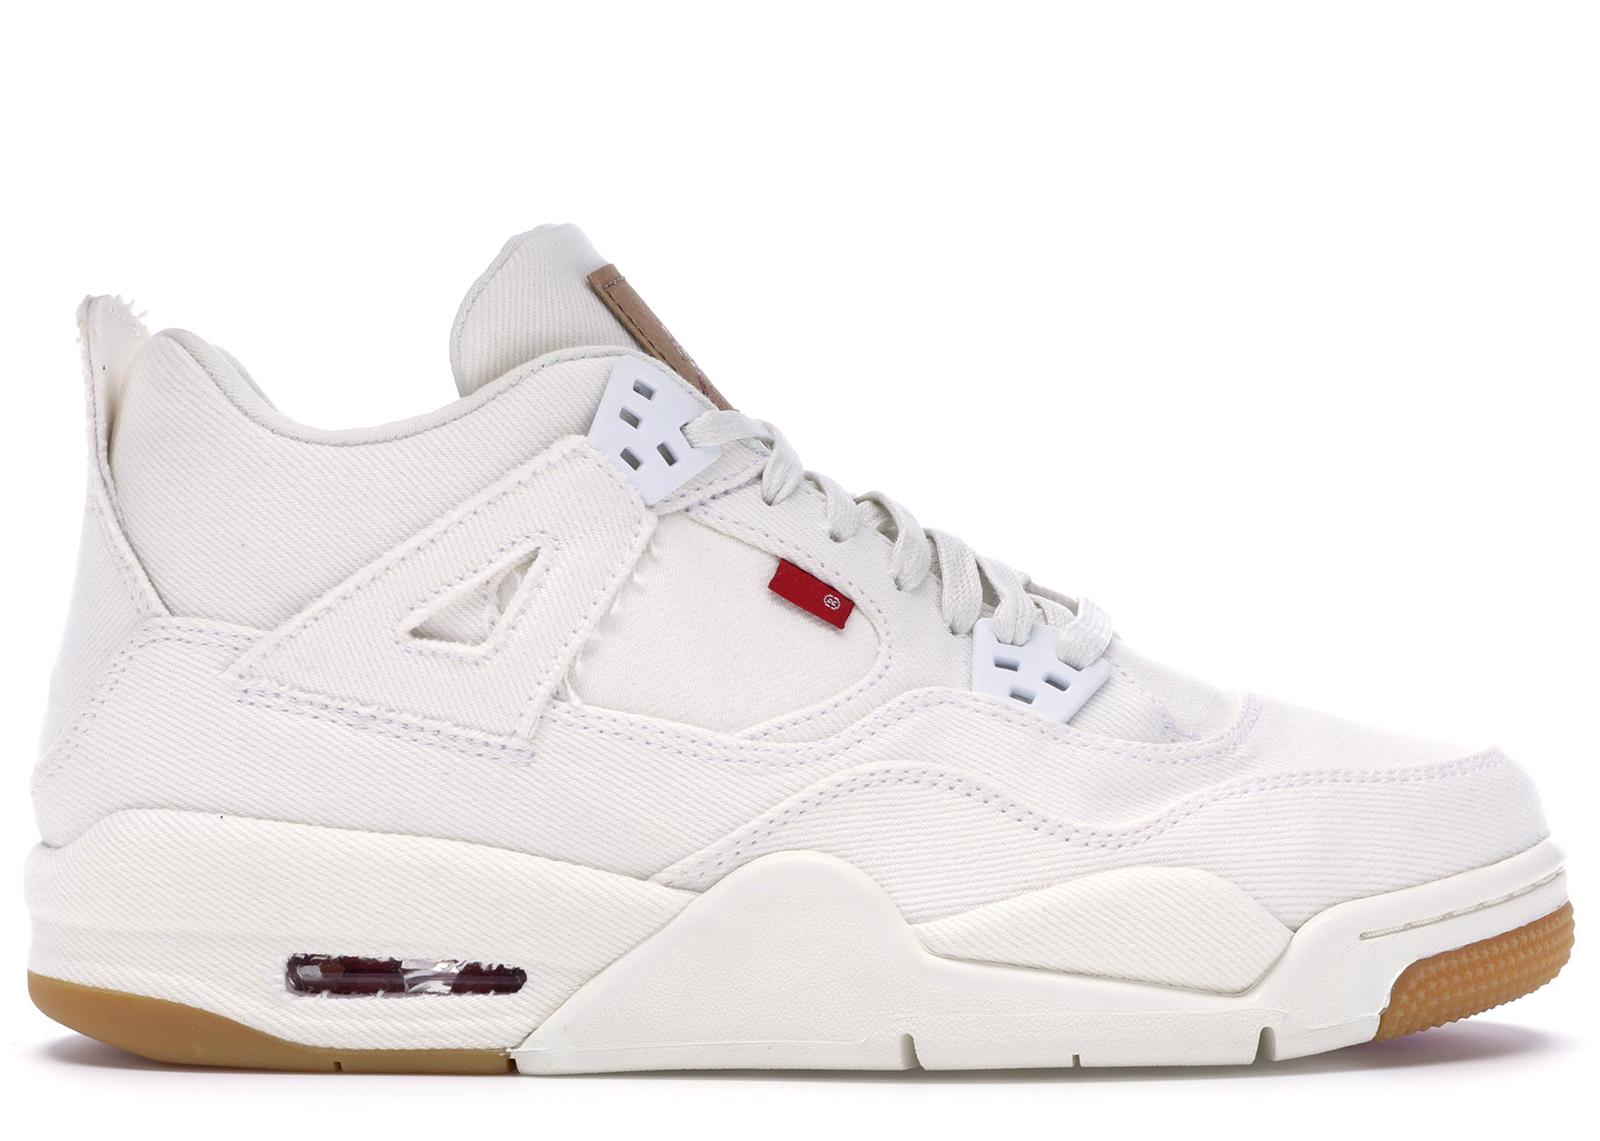 Jordan 4 Retro Levi's White (GS) (Blank